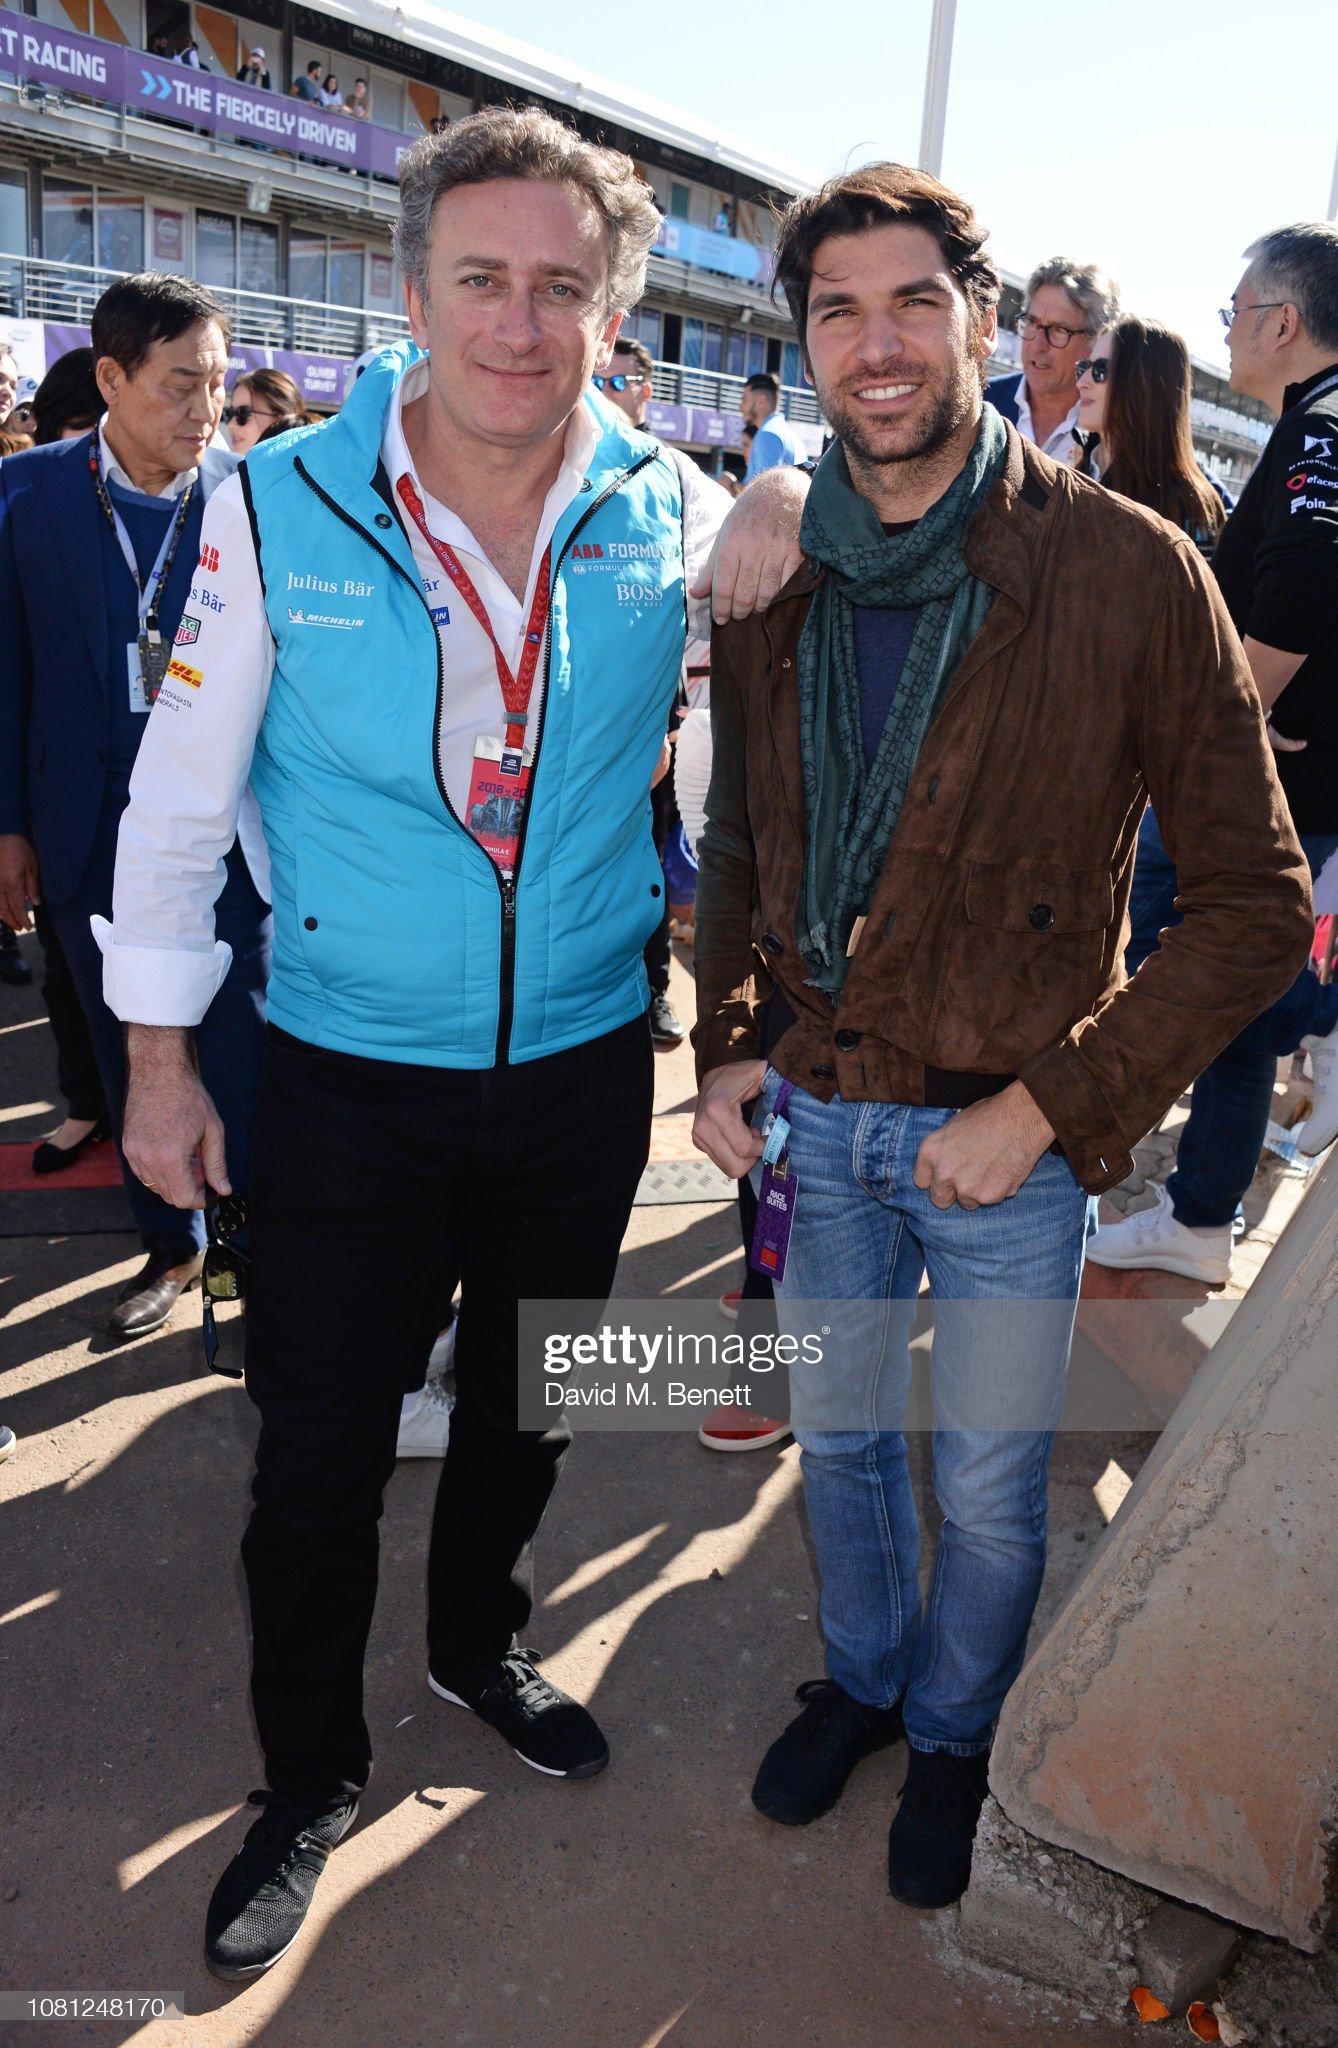 ¿Cuánto mide Alejandro Agag? - Altura - Real height Formula-e-ceo-alejandro-agag-and-cayetano-rivera-ordonez-attend-the-picture-id1081248170?s=2048x2048